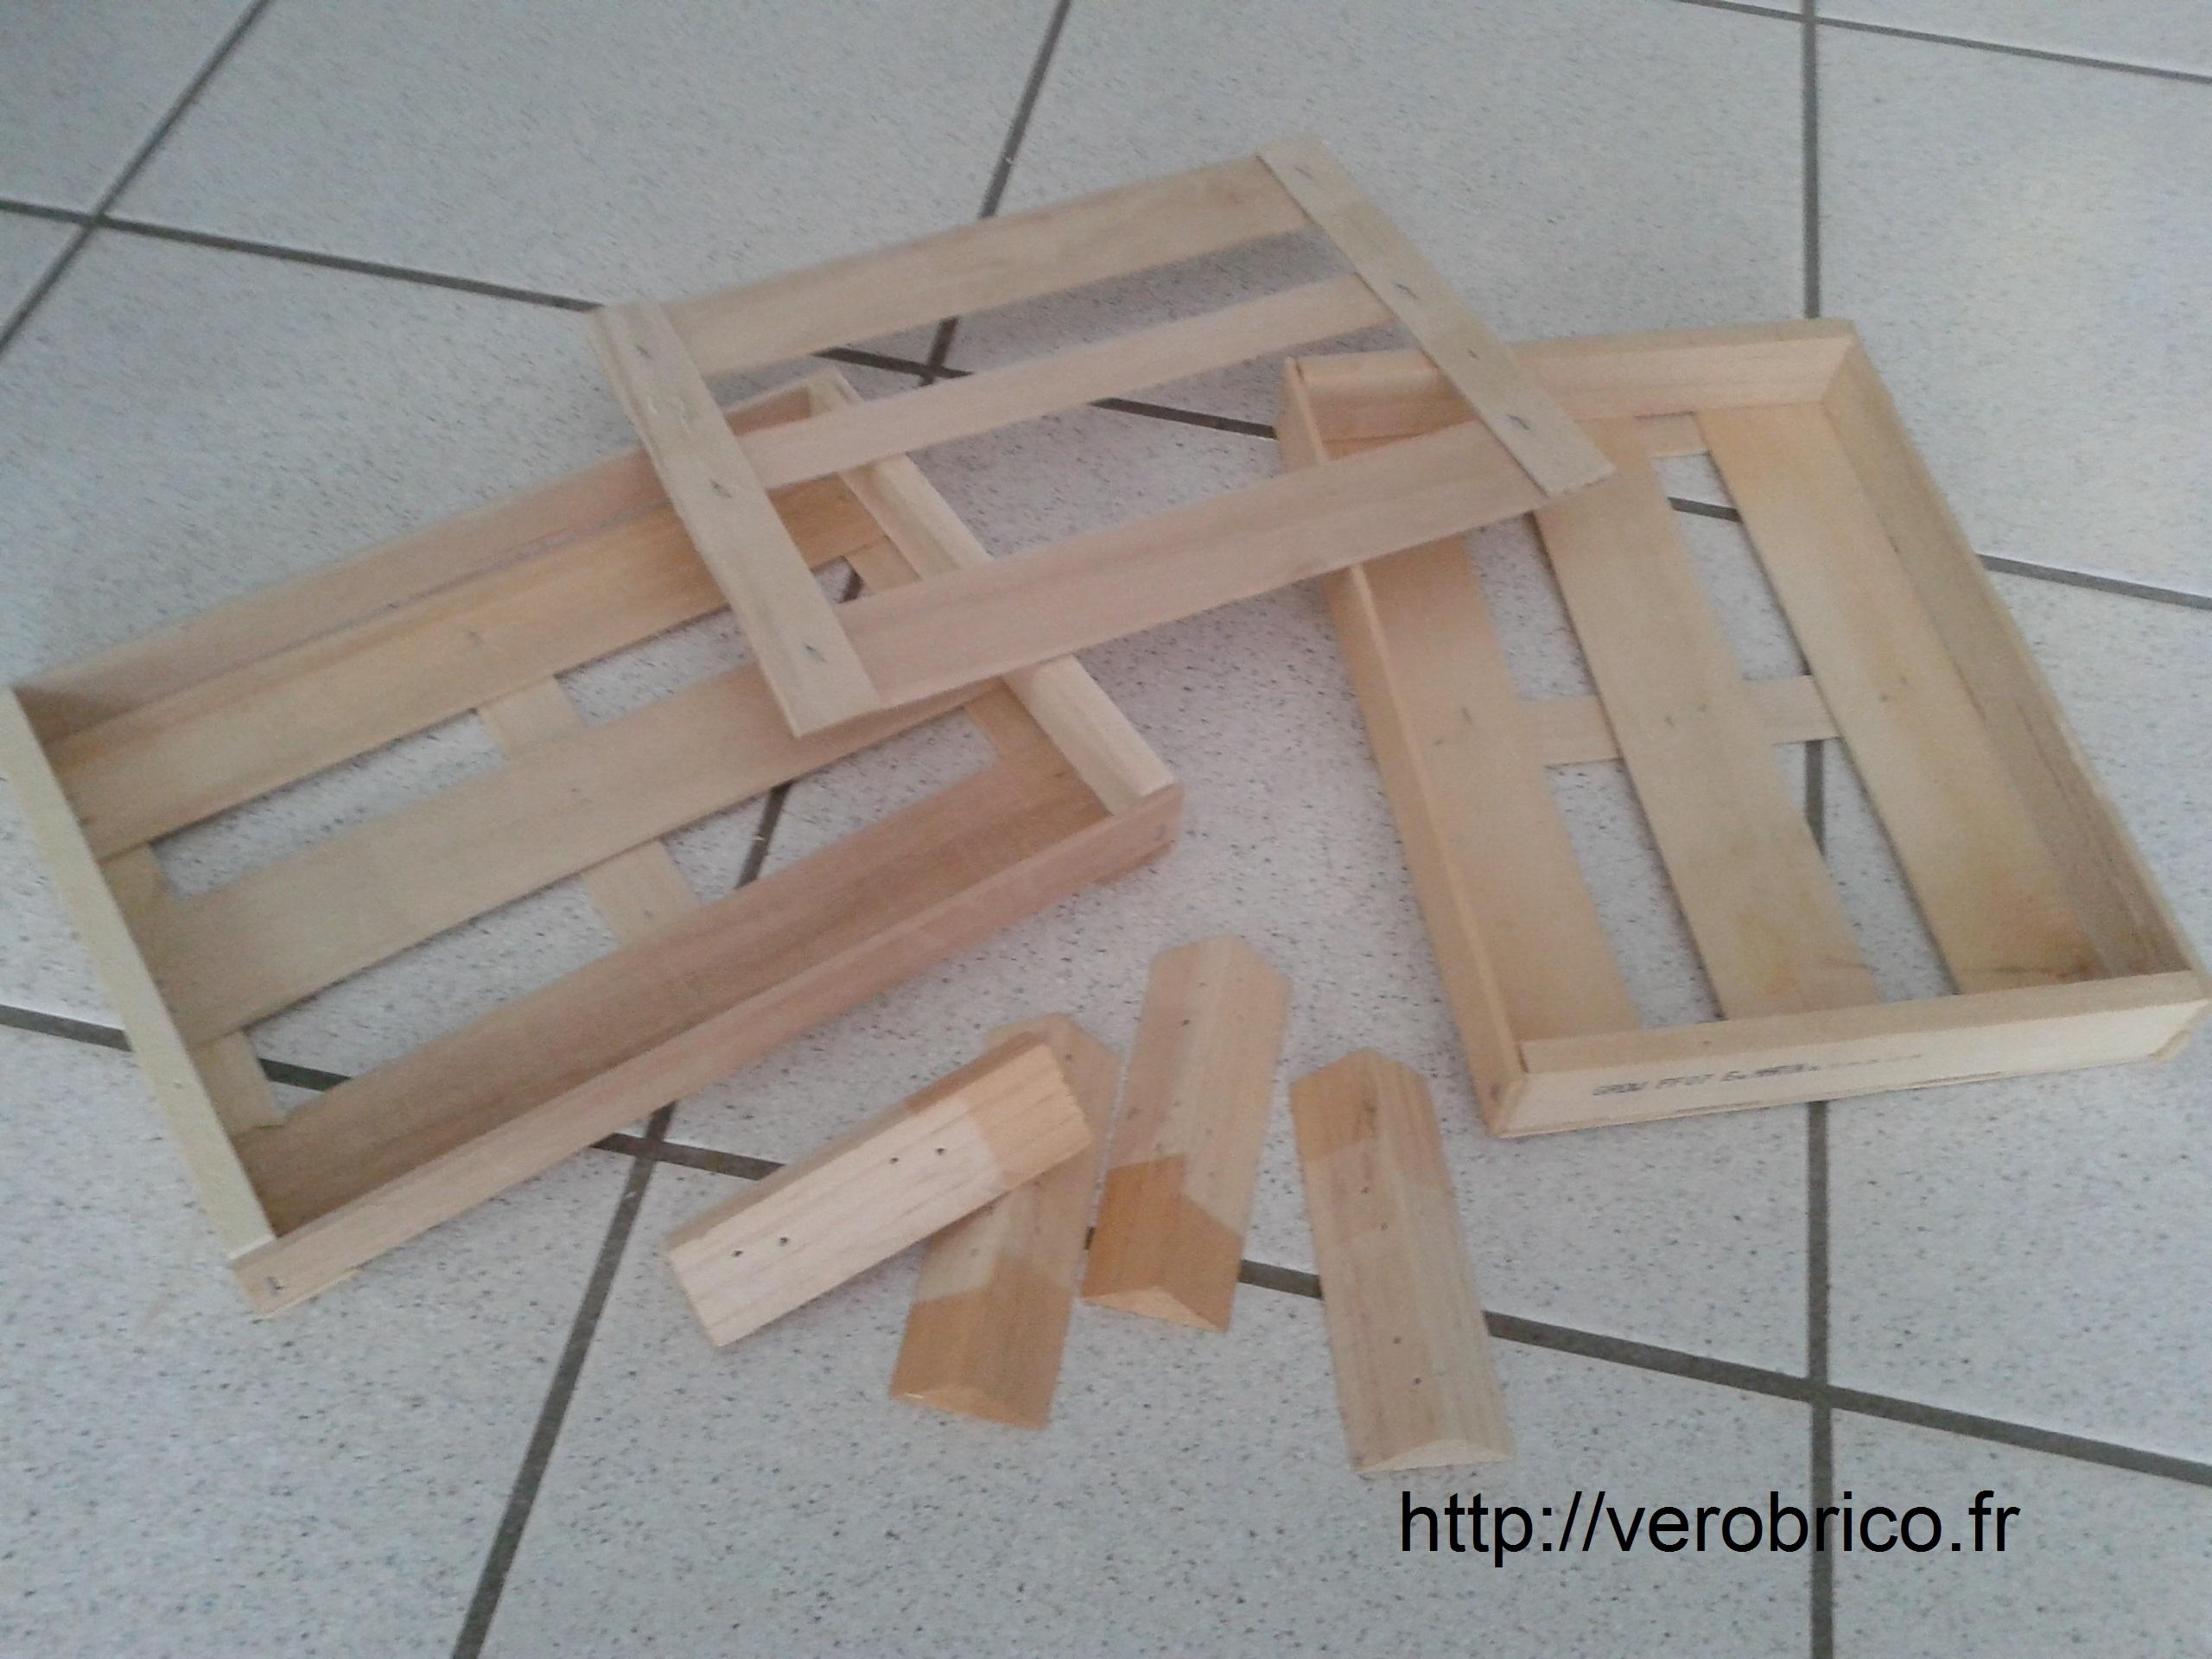 corbeille rustique le coin bricolage de v robrico. Black Bedroom Furniture Sets. Home Design Ideas